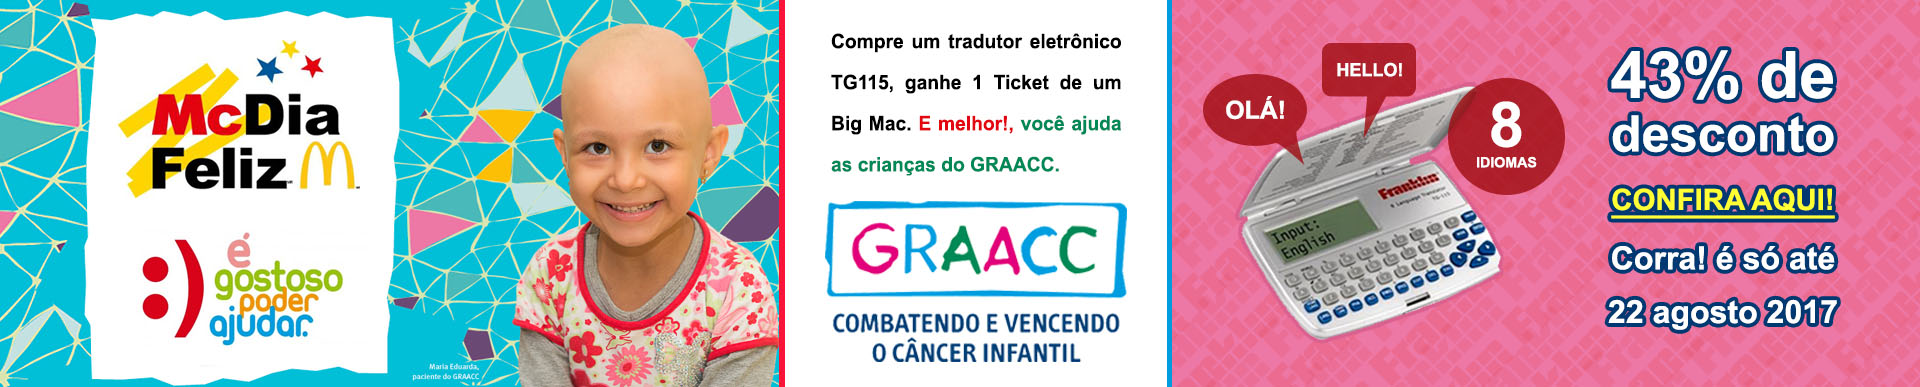 Mc Dia Feliz - GRAACC - Franklin TG115